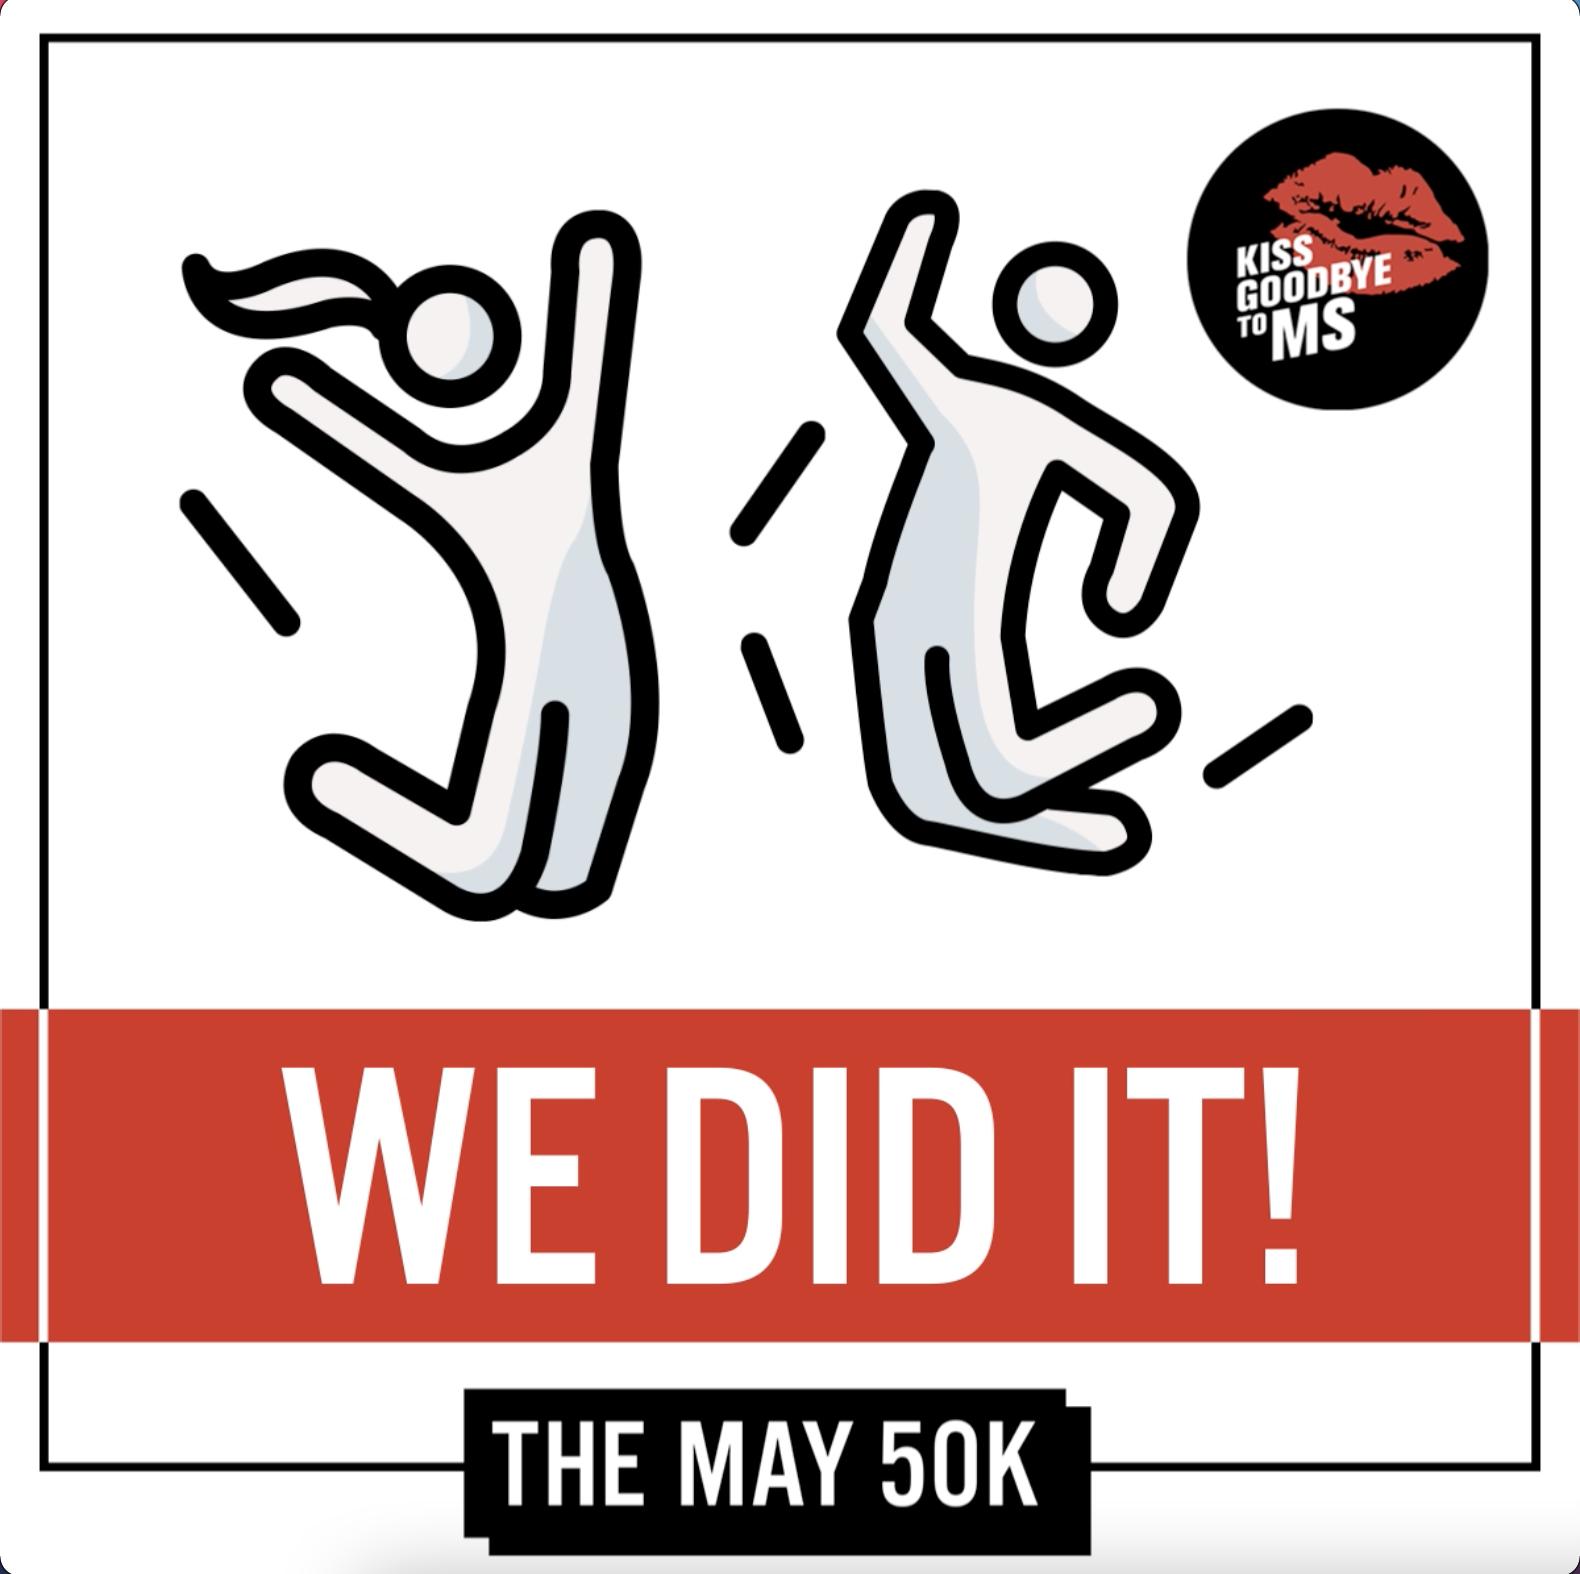 Social Posts - We did it